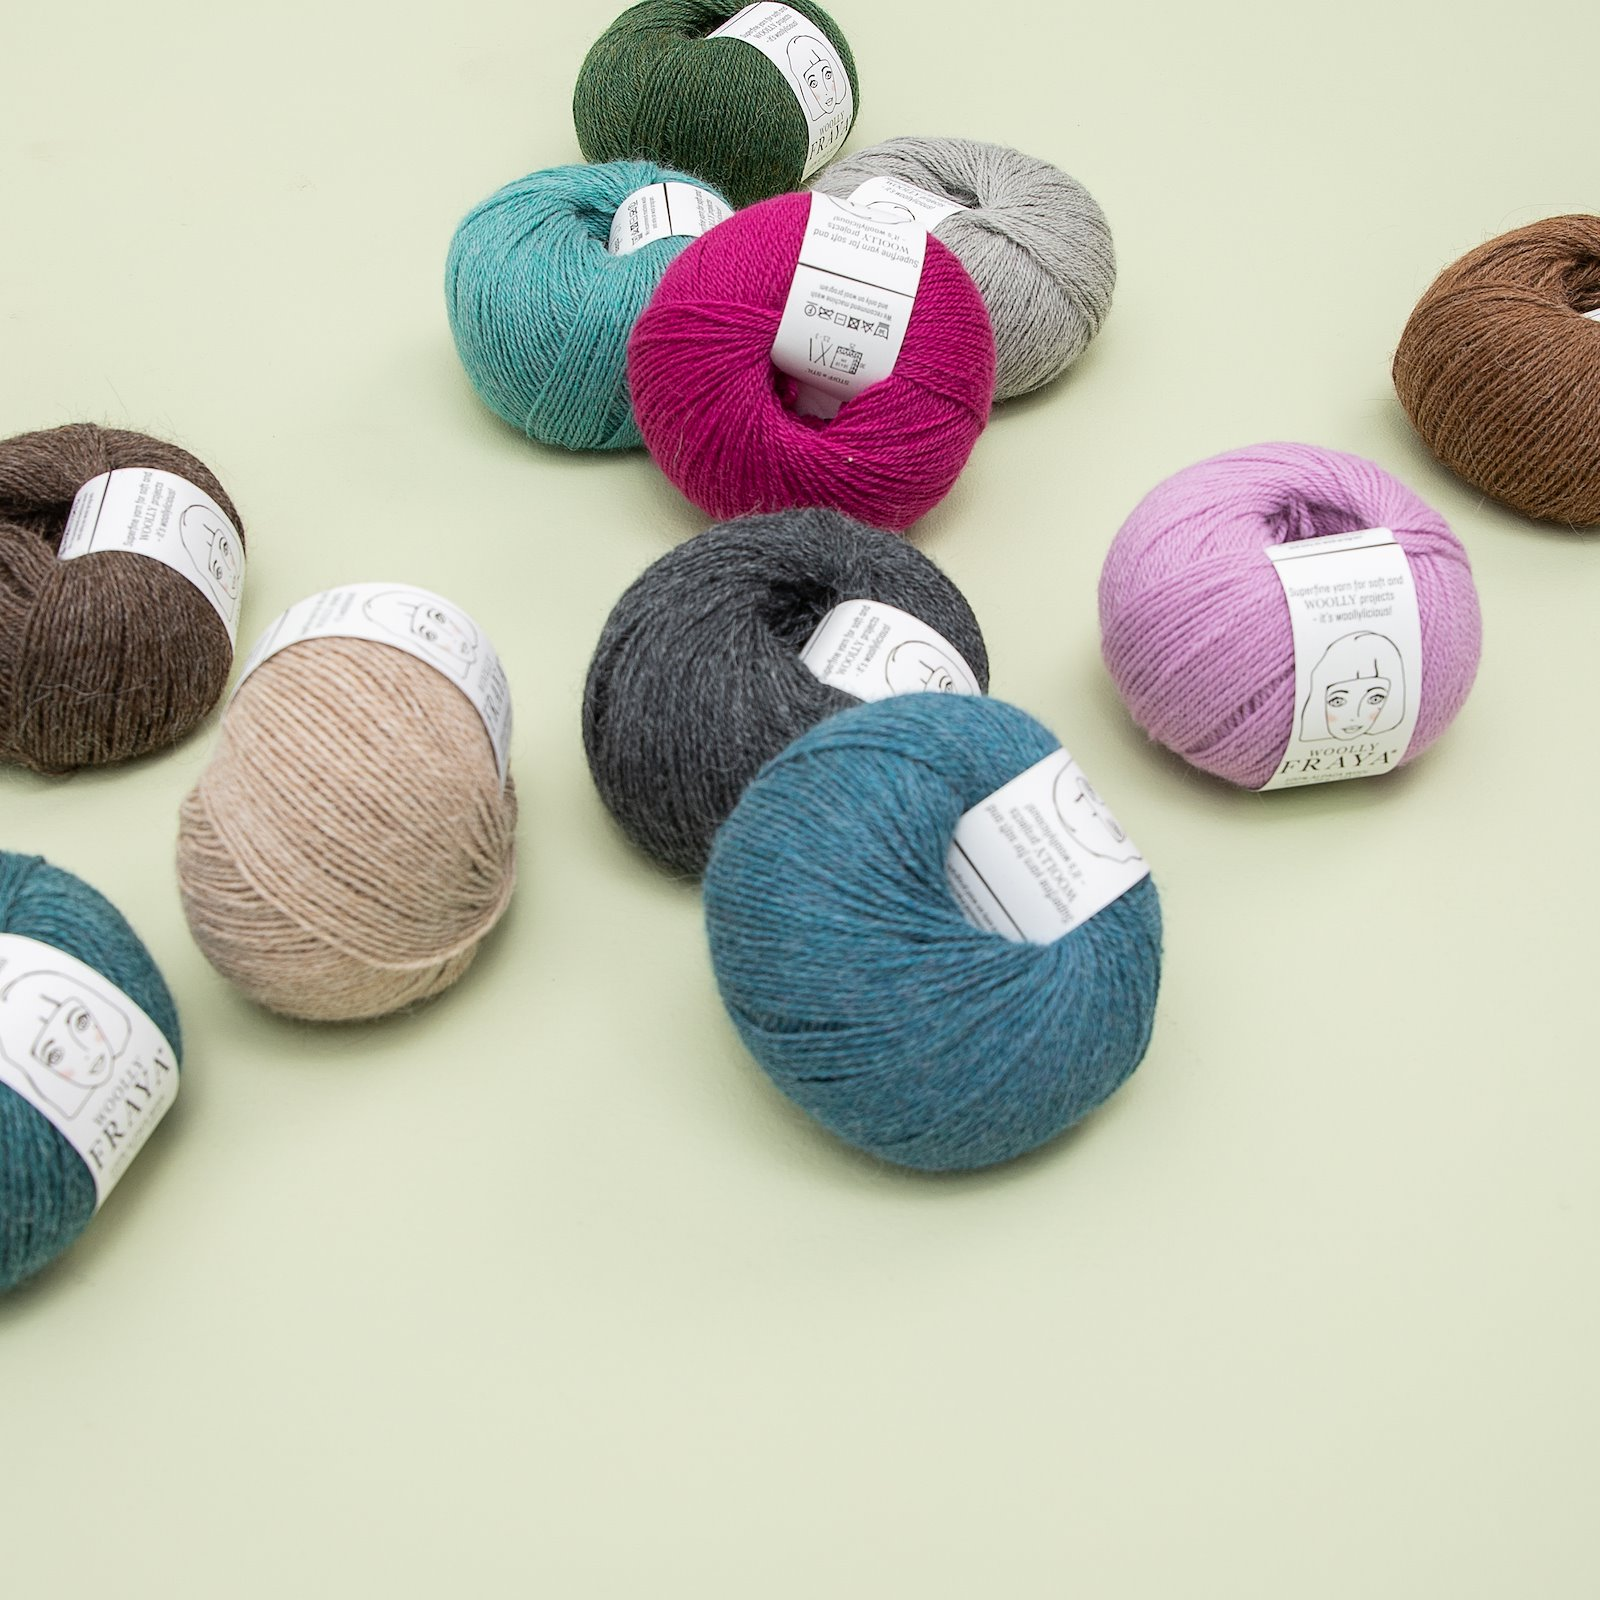 Woolly 50g aqua melange 90000062_90000064_90000066_90000068_90000069_90000070_bundle